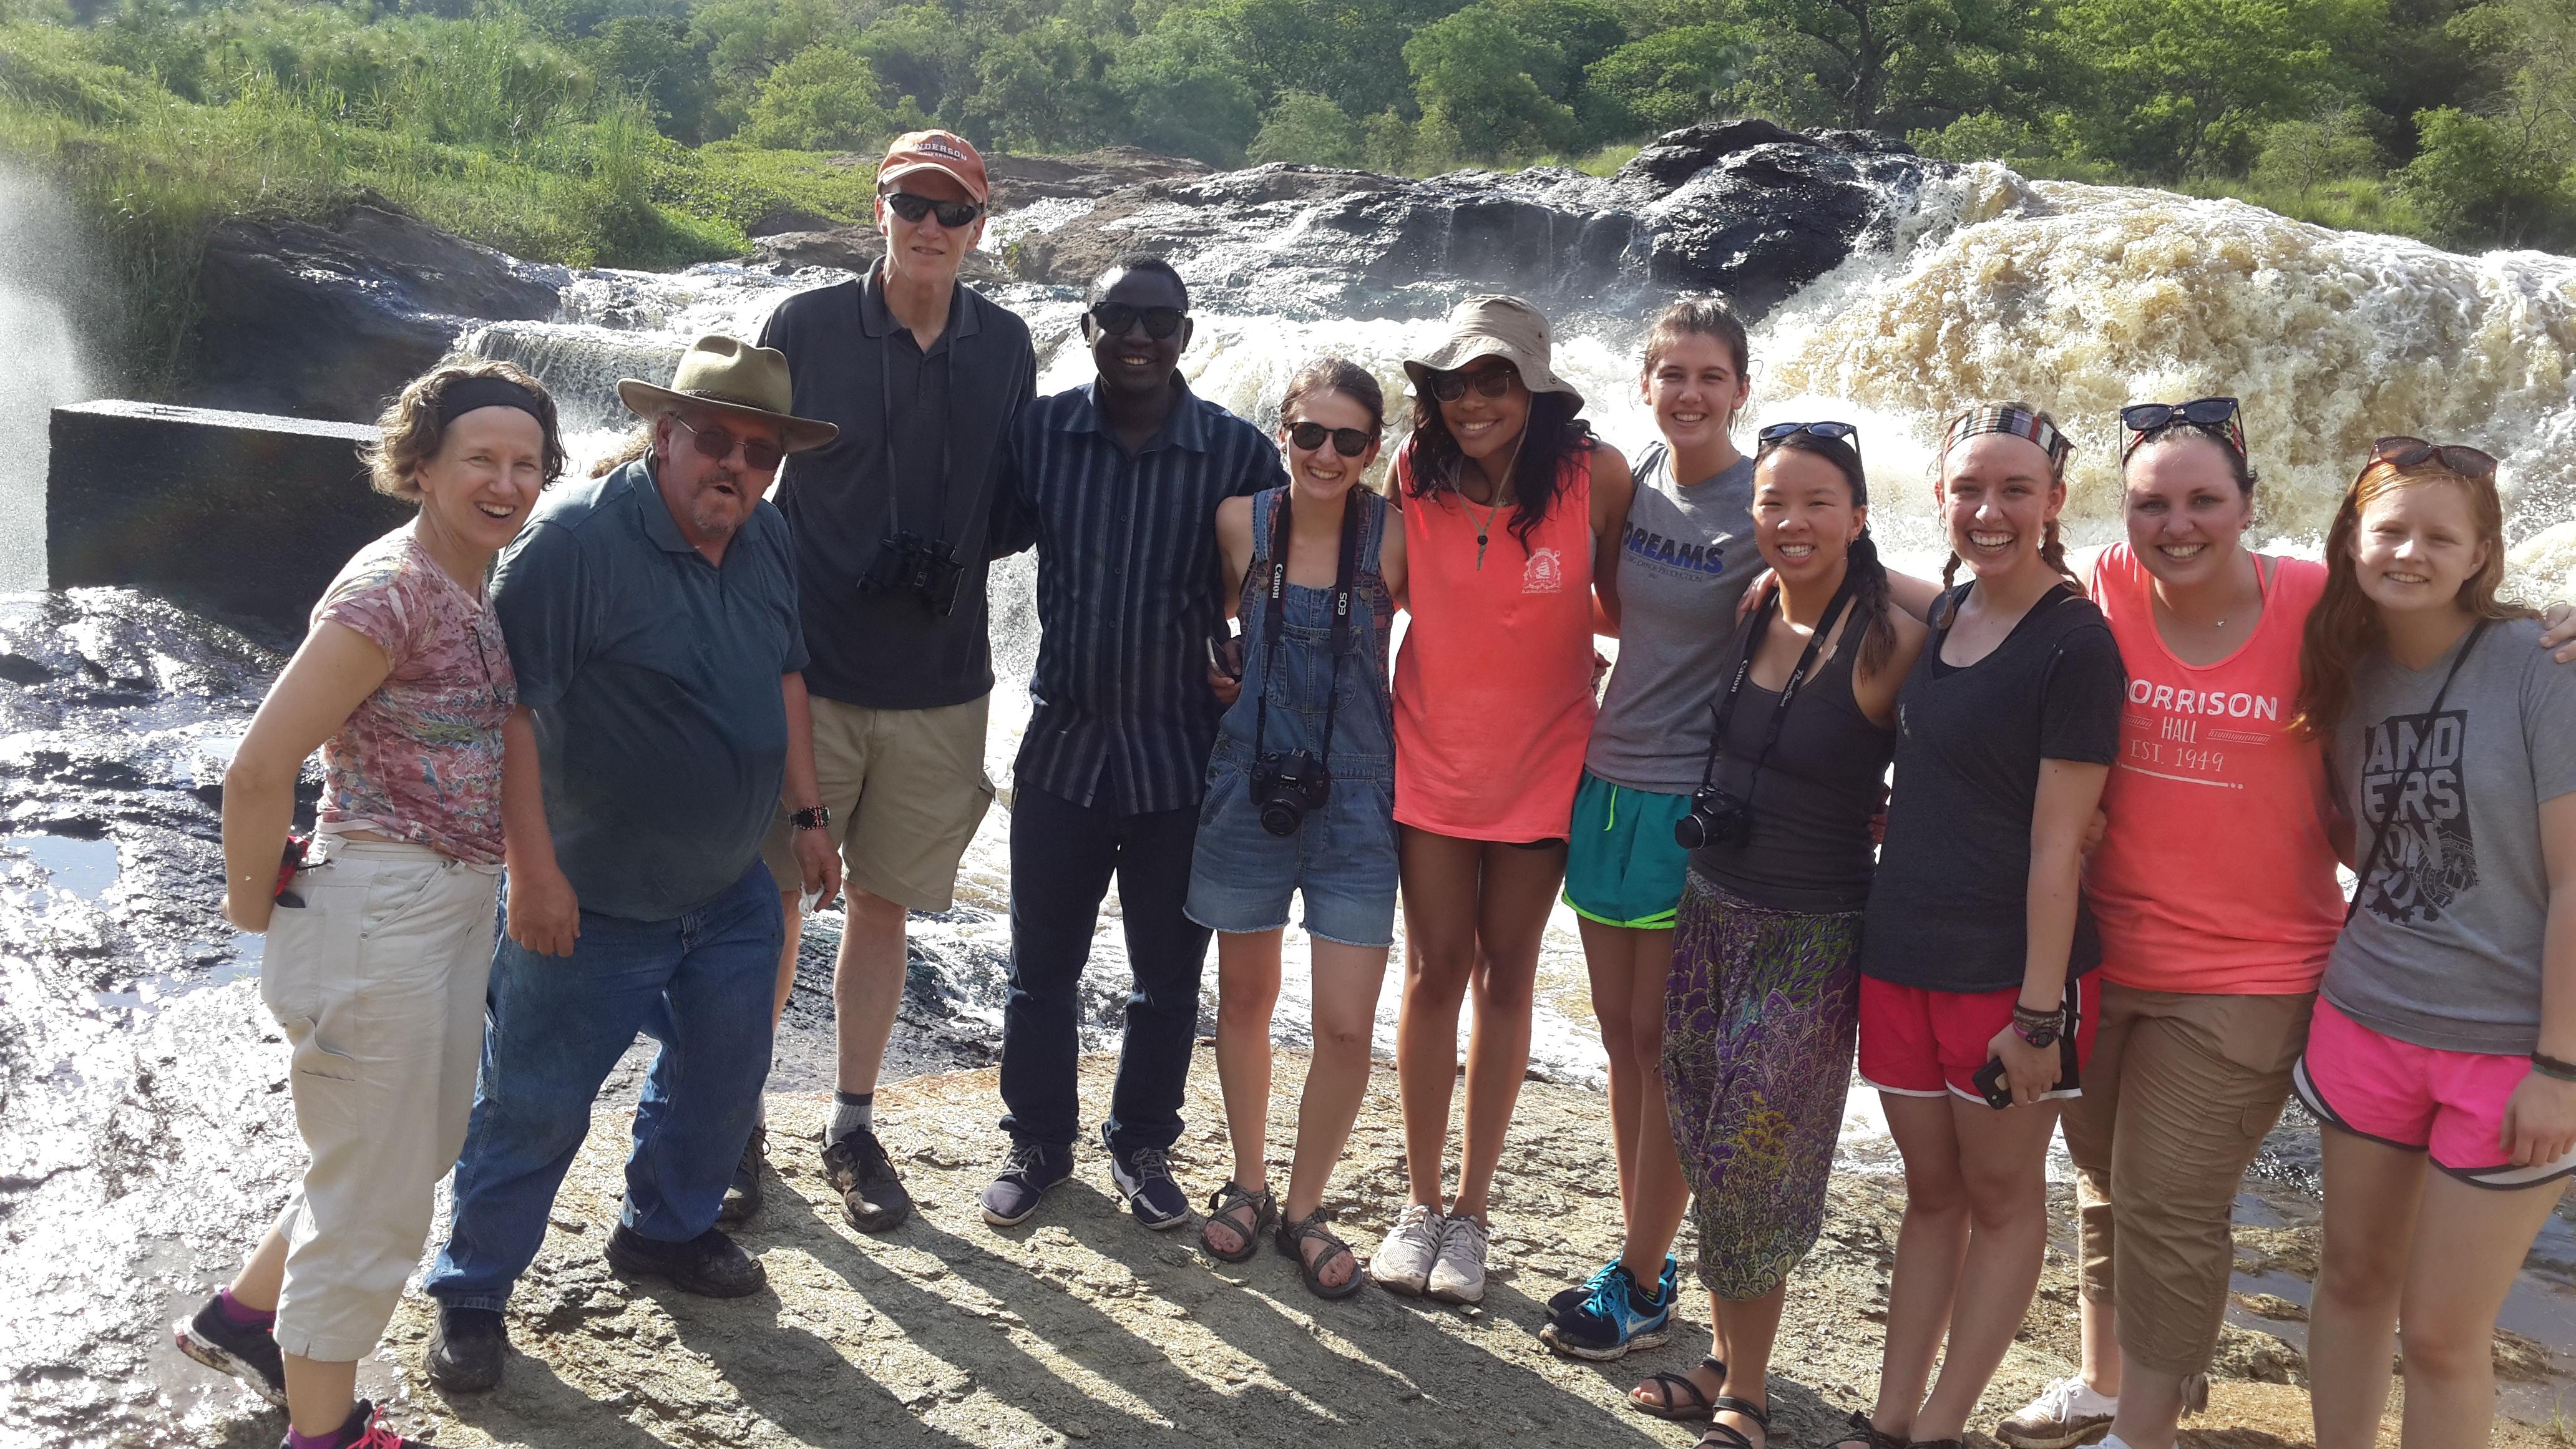 hike to the top of Murchison Falls. - 15 Days Uganda wildlife, Gorilla and Chimpanzee trekking safari